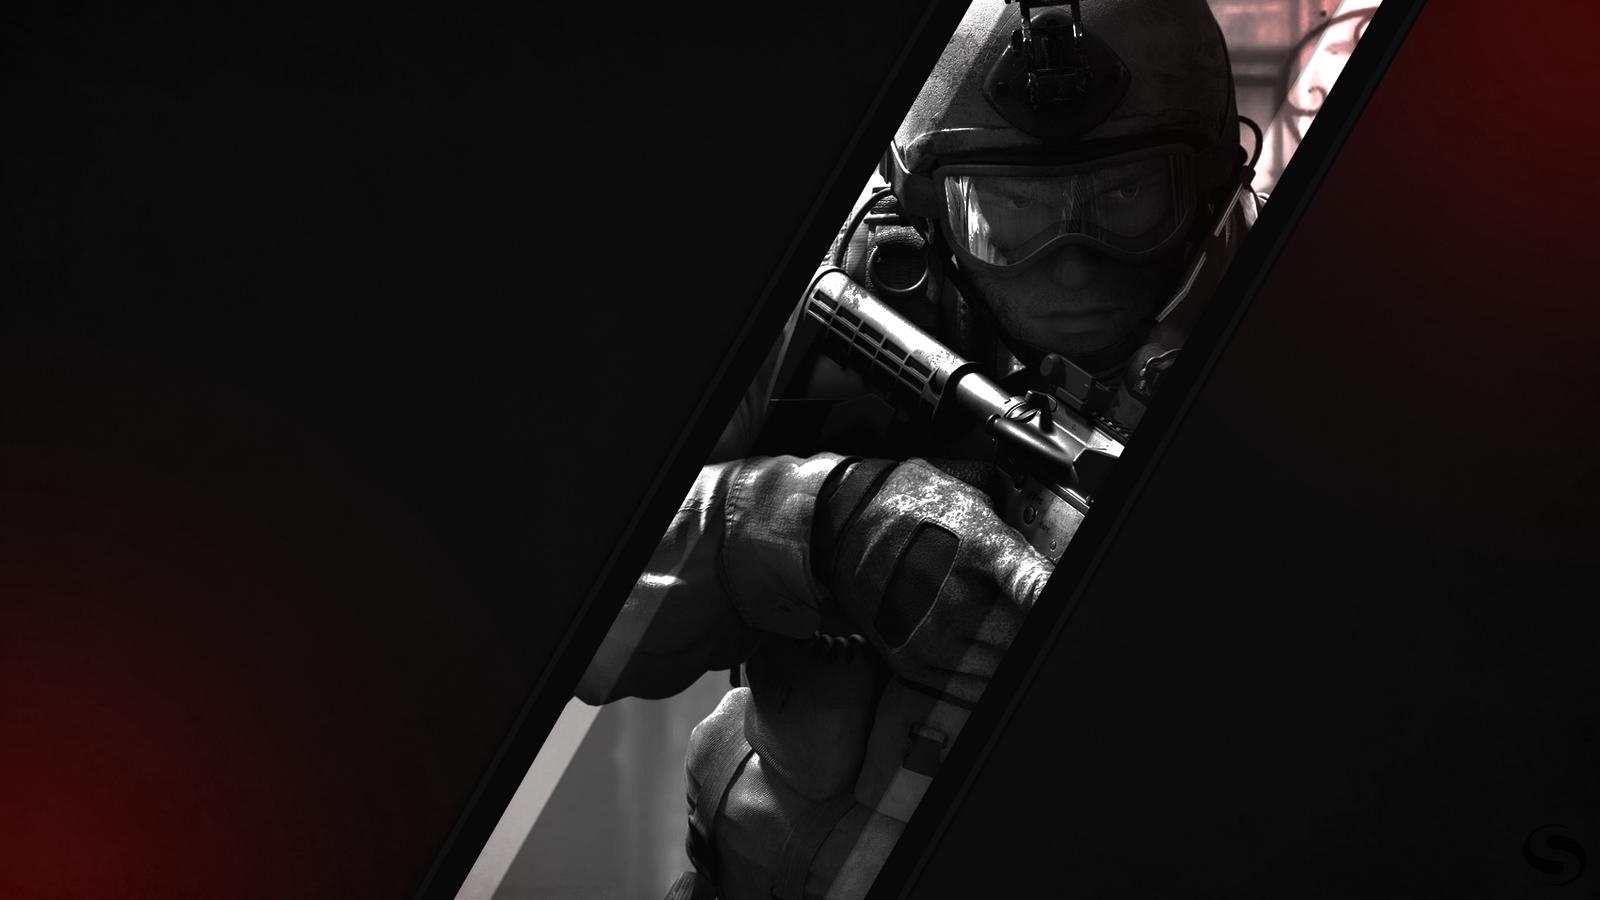 Counter Strike: Global Offensive CT Wallpaper By IamVinn